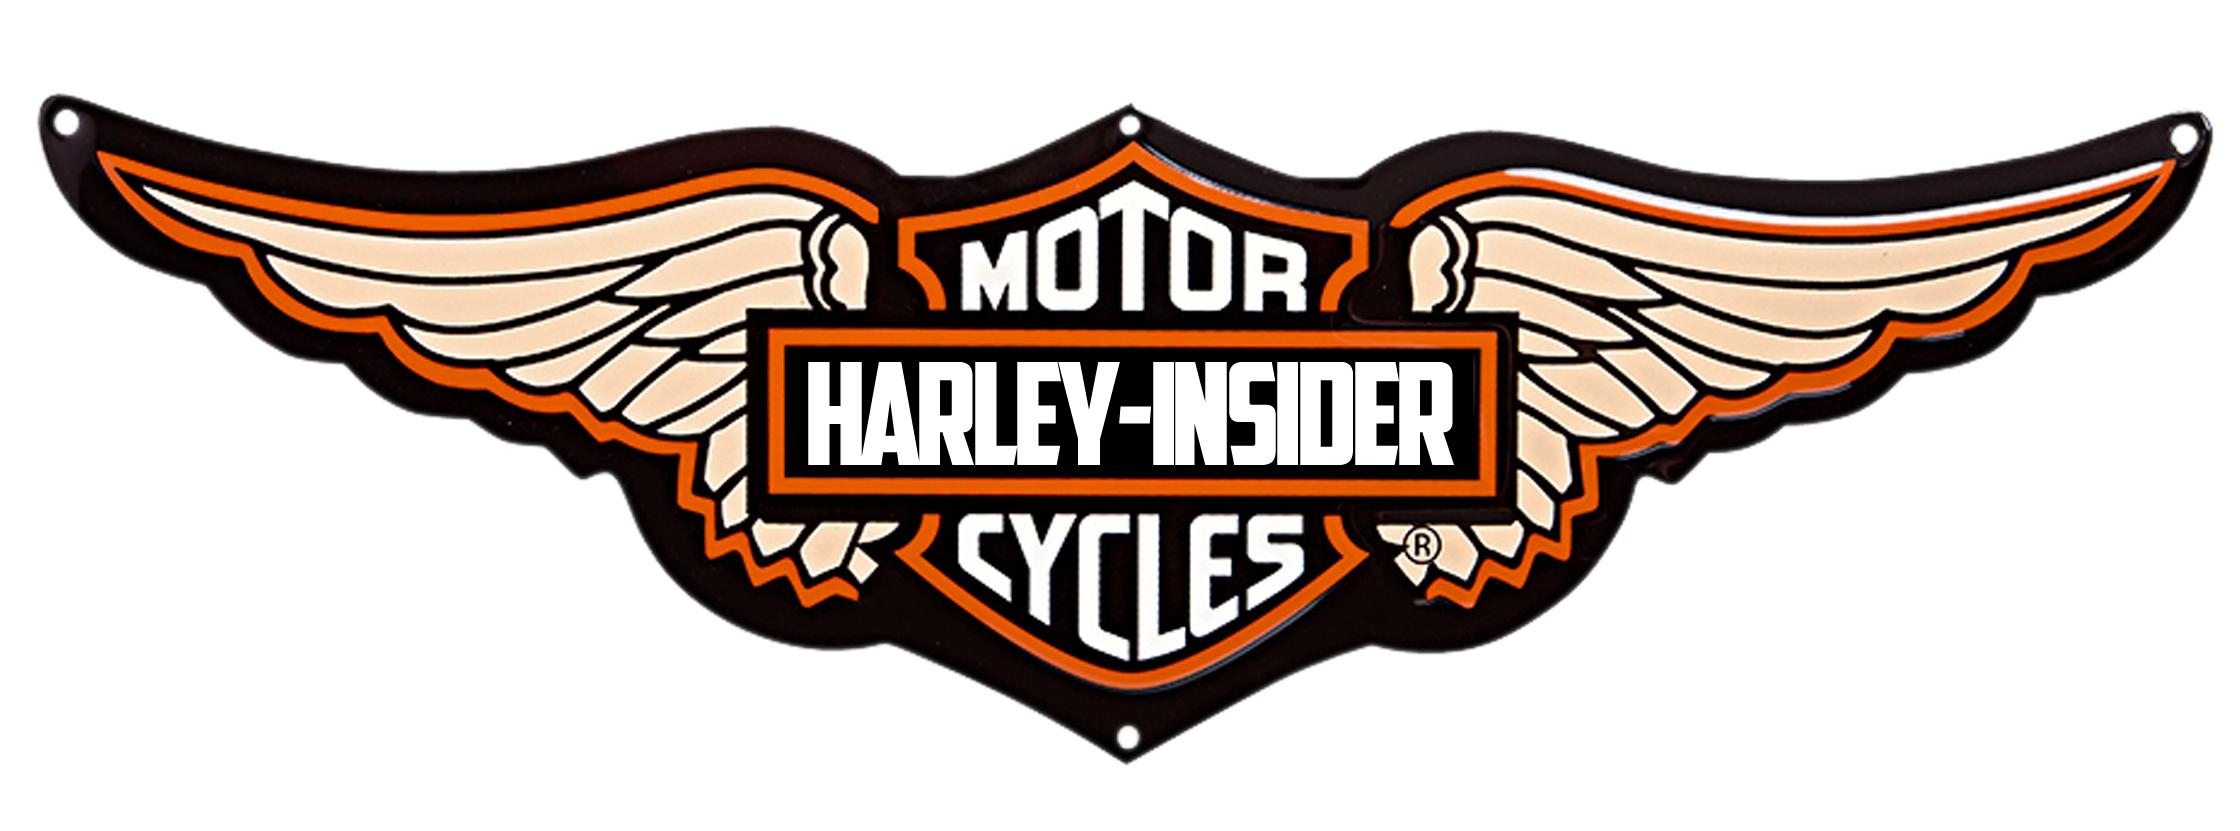 Motorcycle clipart logo. Harley davidson skull pencil